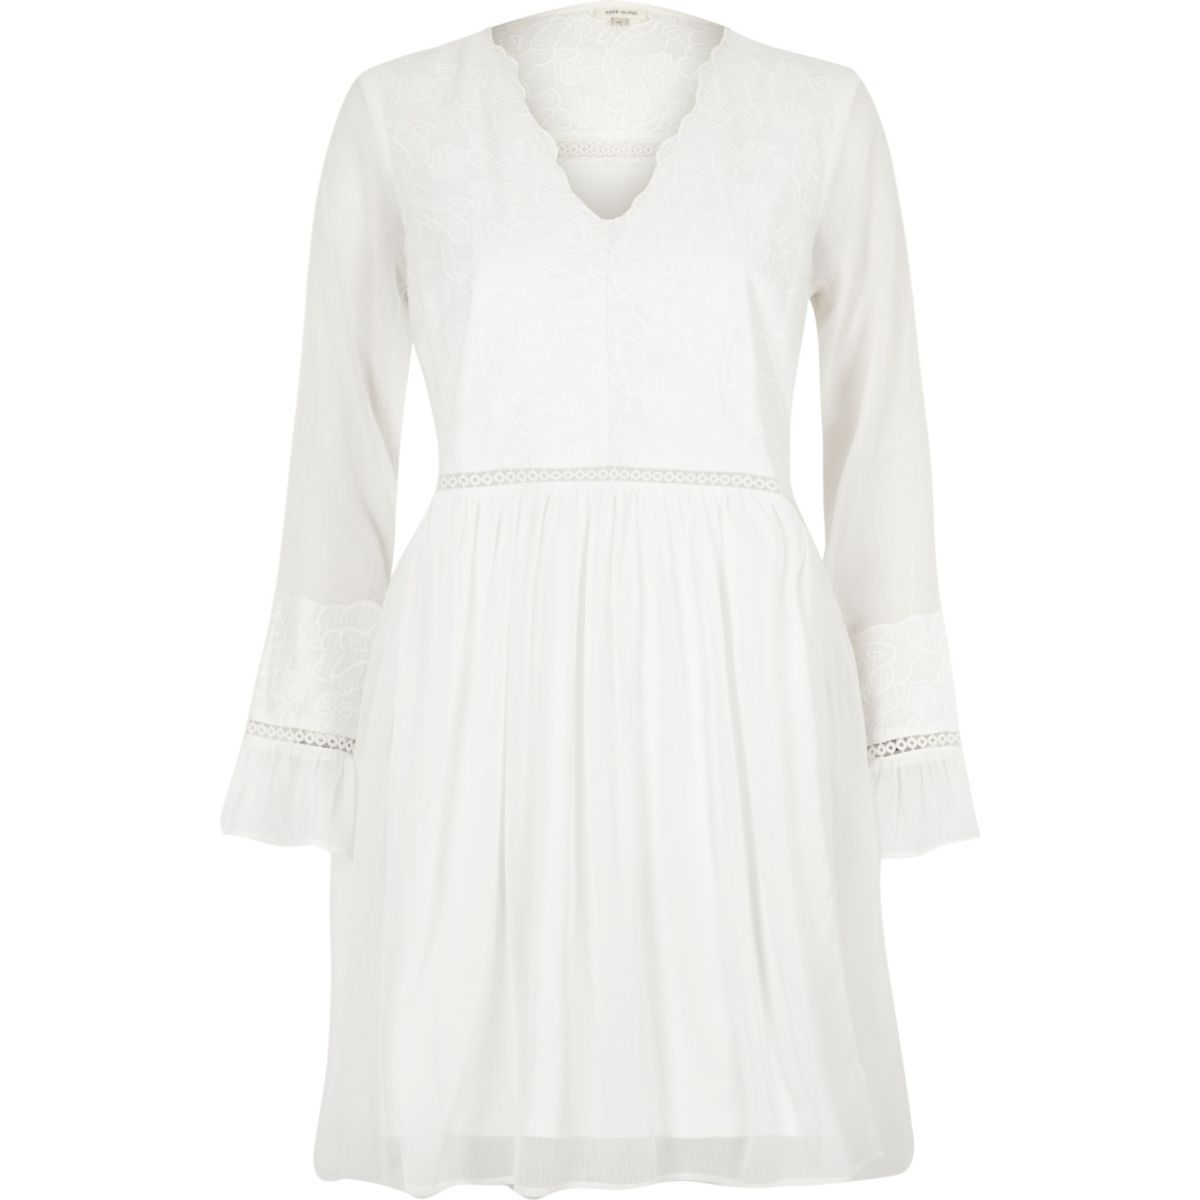 Cream lace long sleeve smock dress